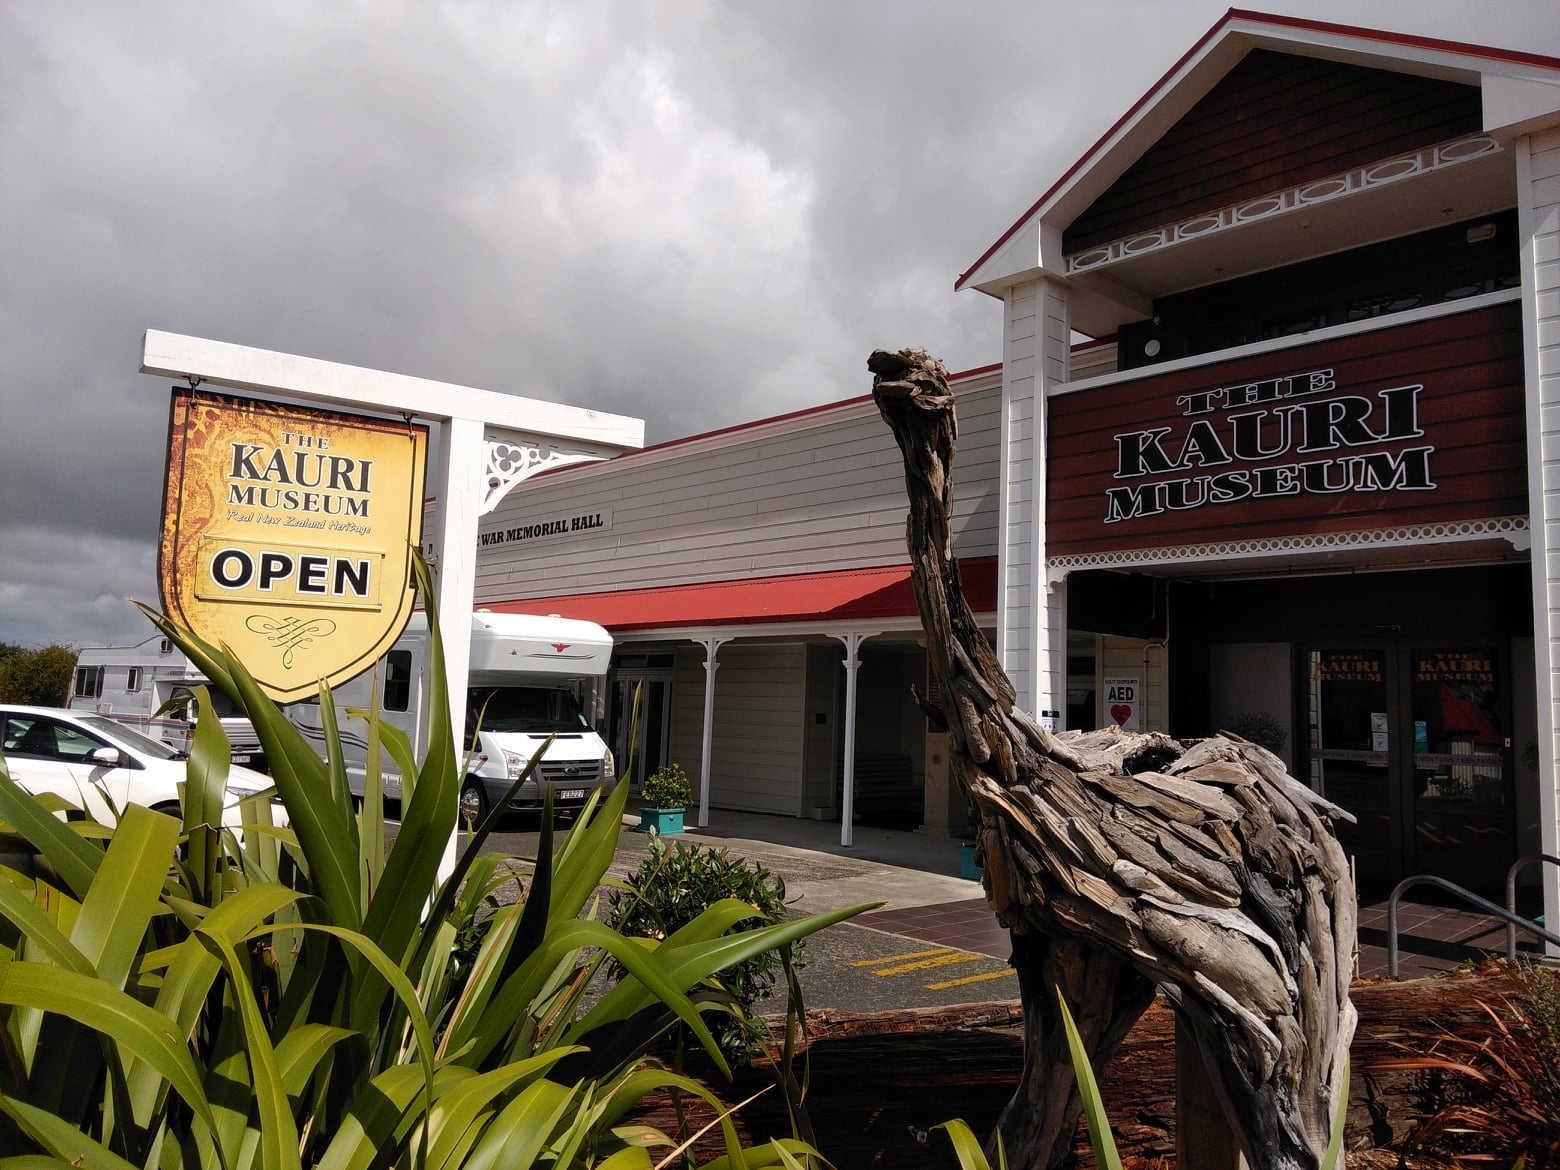 Kauri Museum, Northland, New Zealand @KauriMuseum